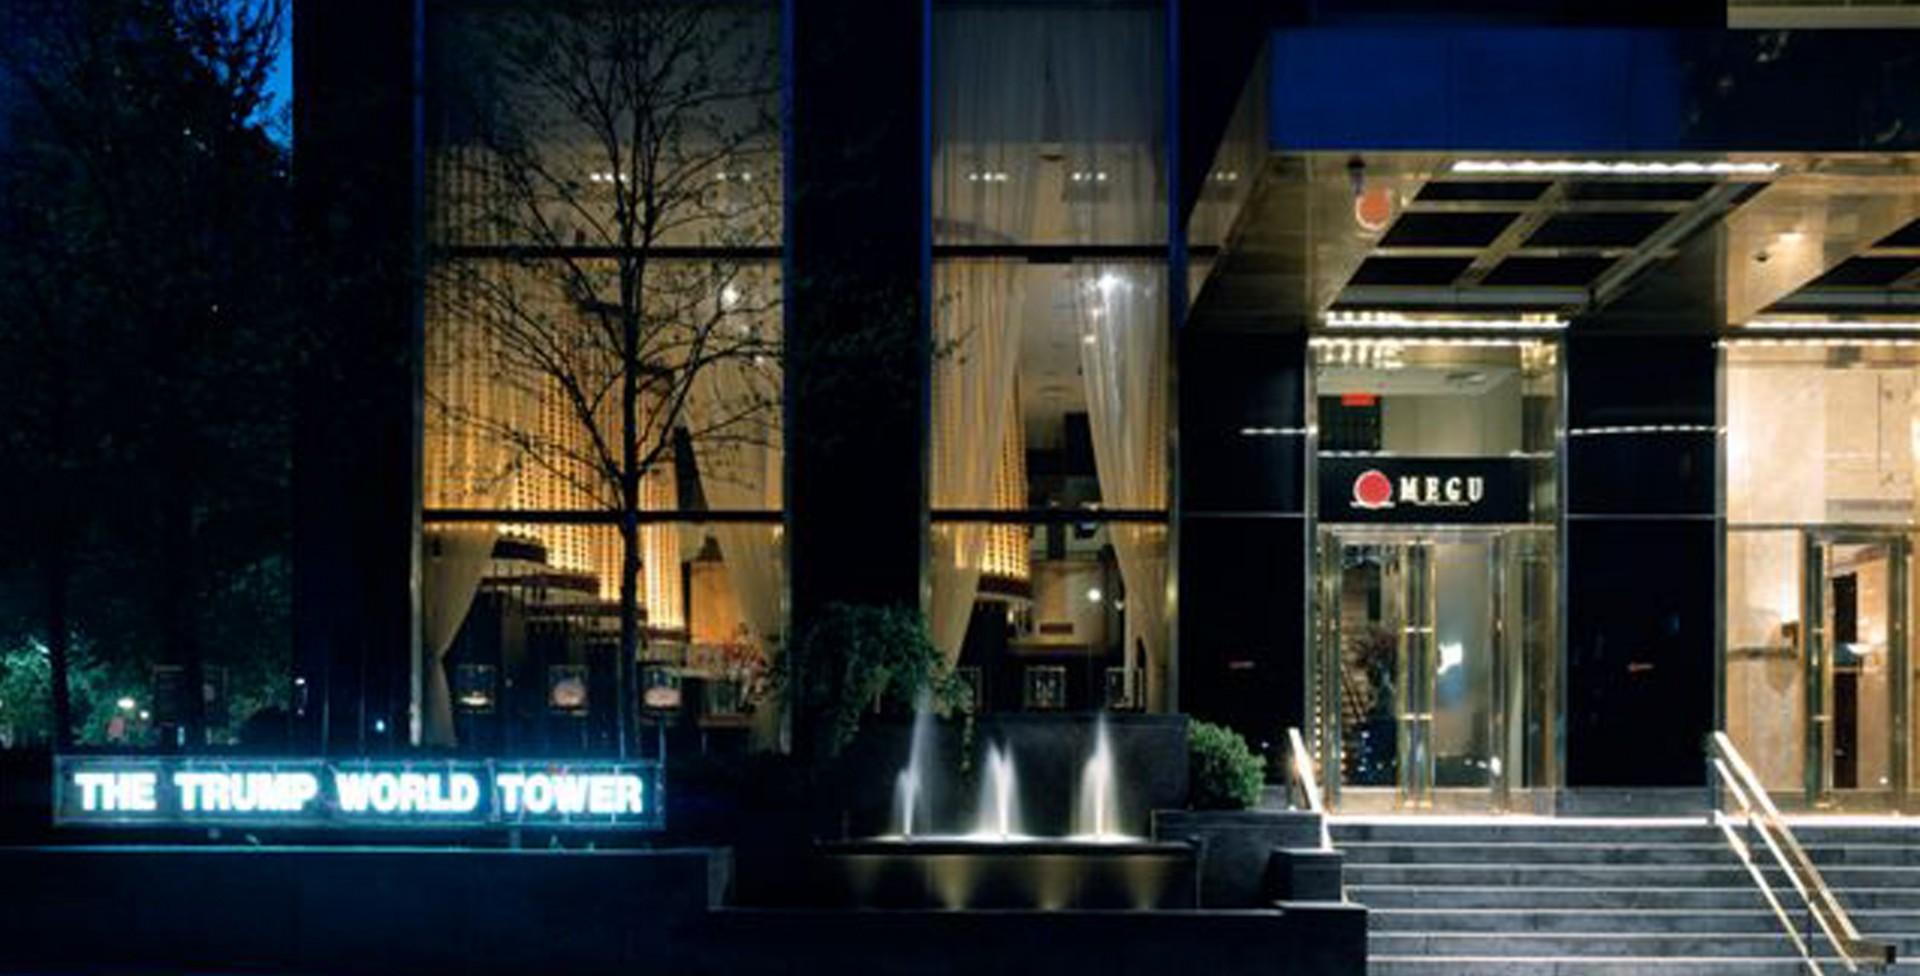 Marin Architects 183 Megu Trump World Tower